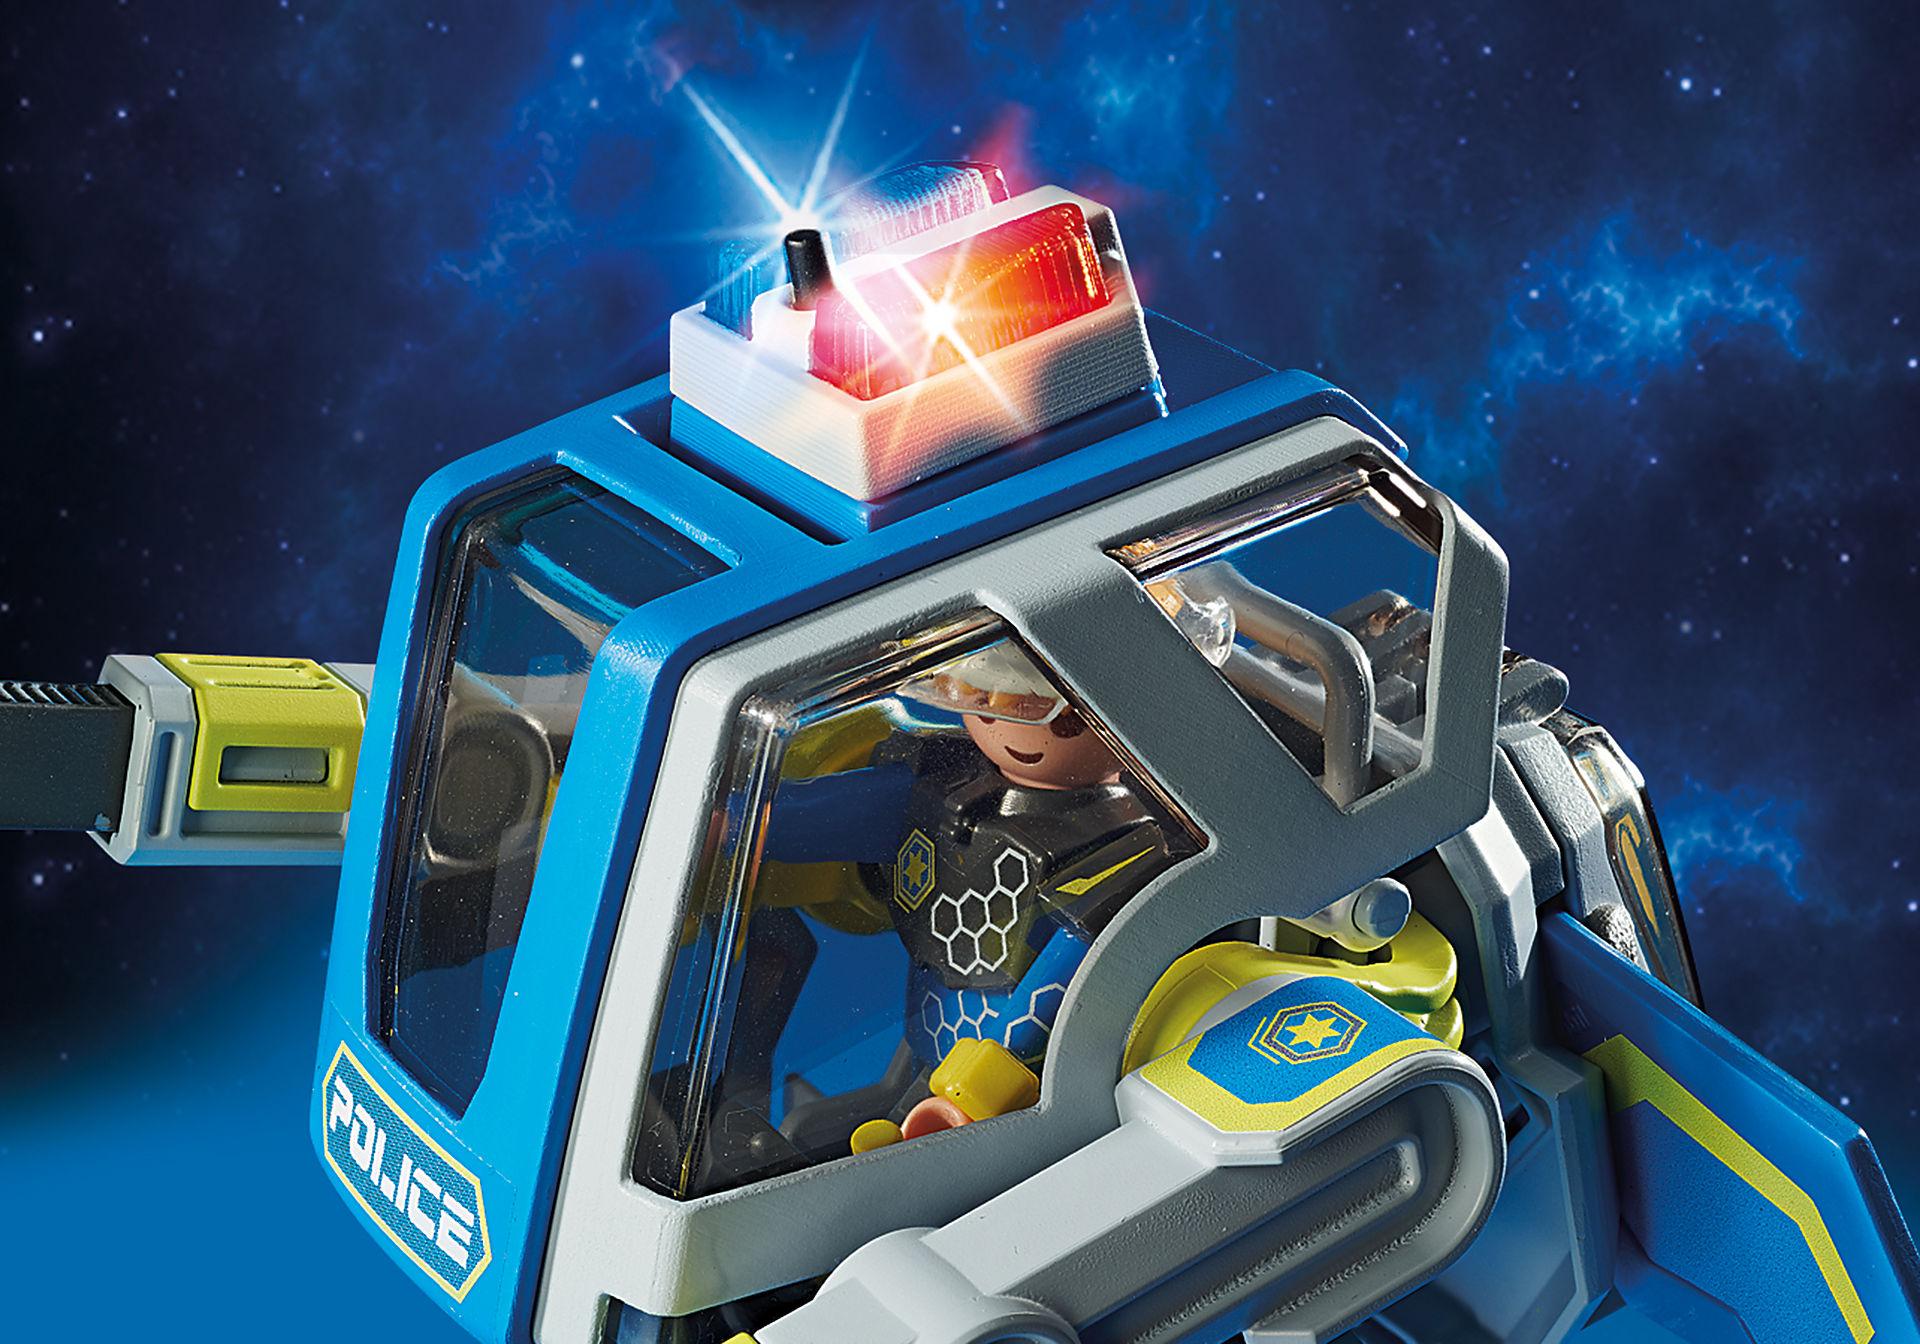 70021 Polícia Galáctica Robot zoom image4